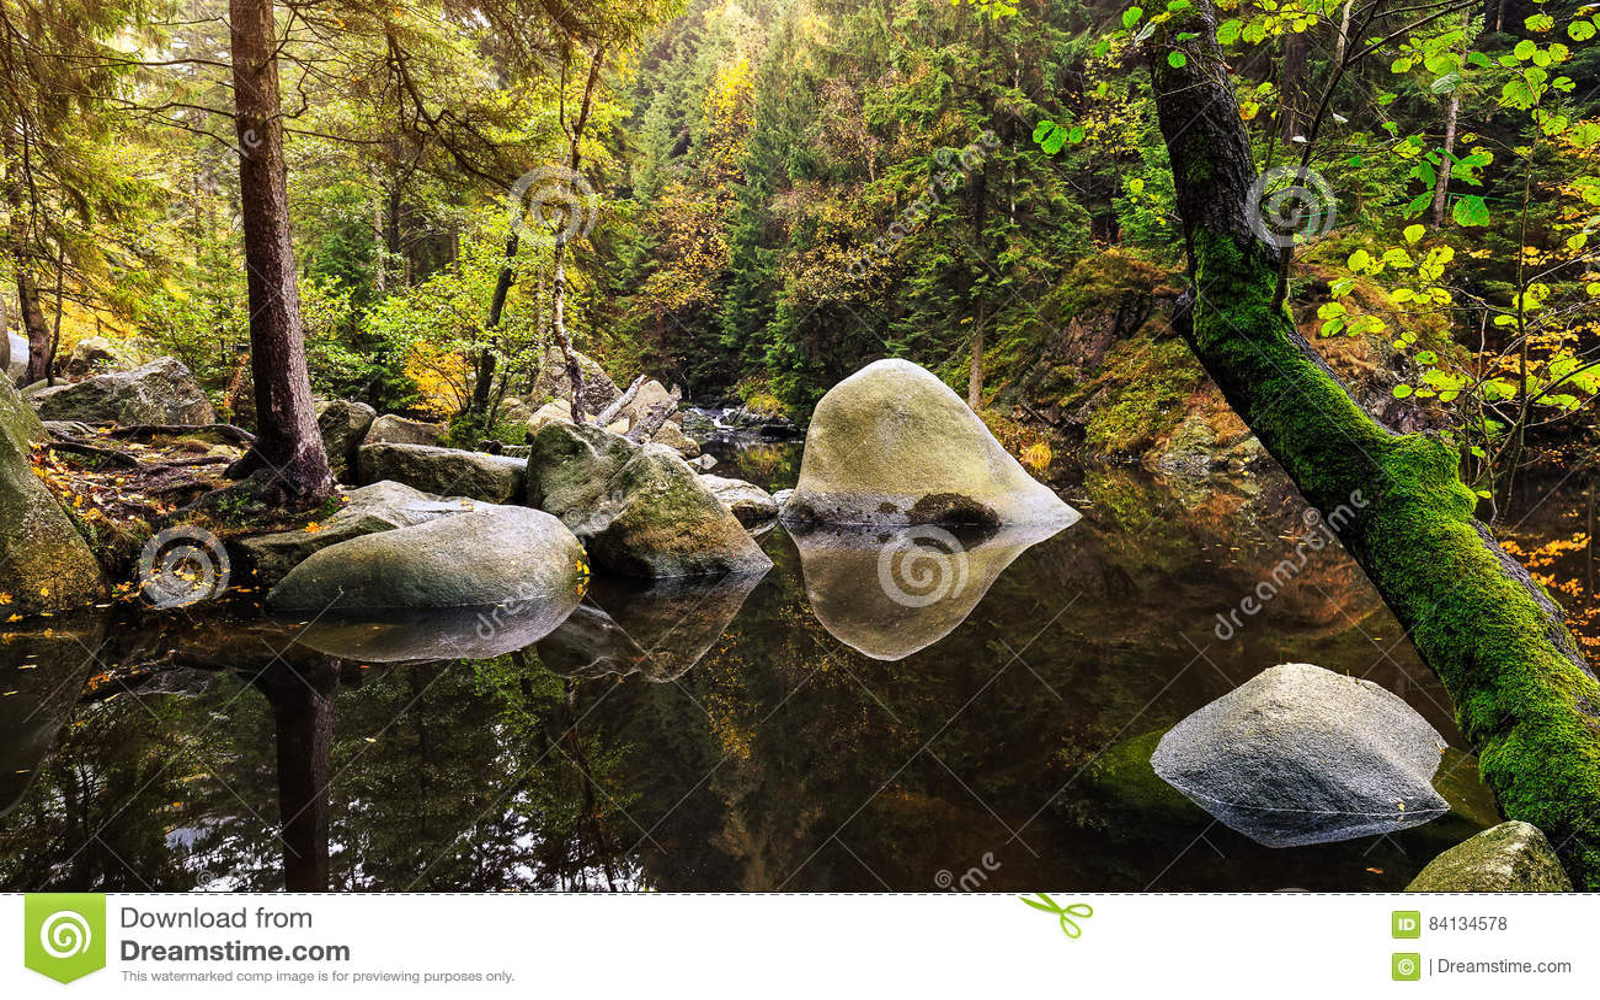 Verlobungsinsel In The River Oker Stock Photo - Image of